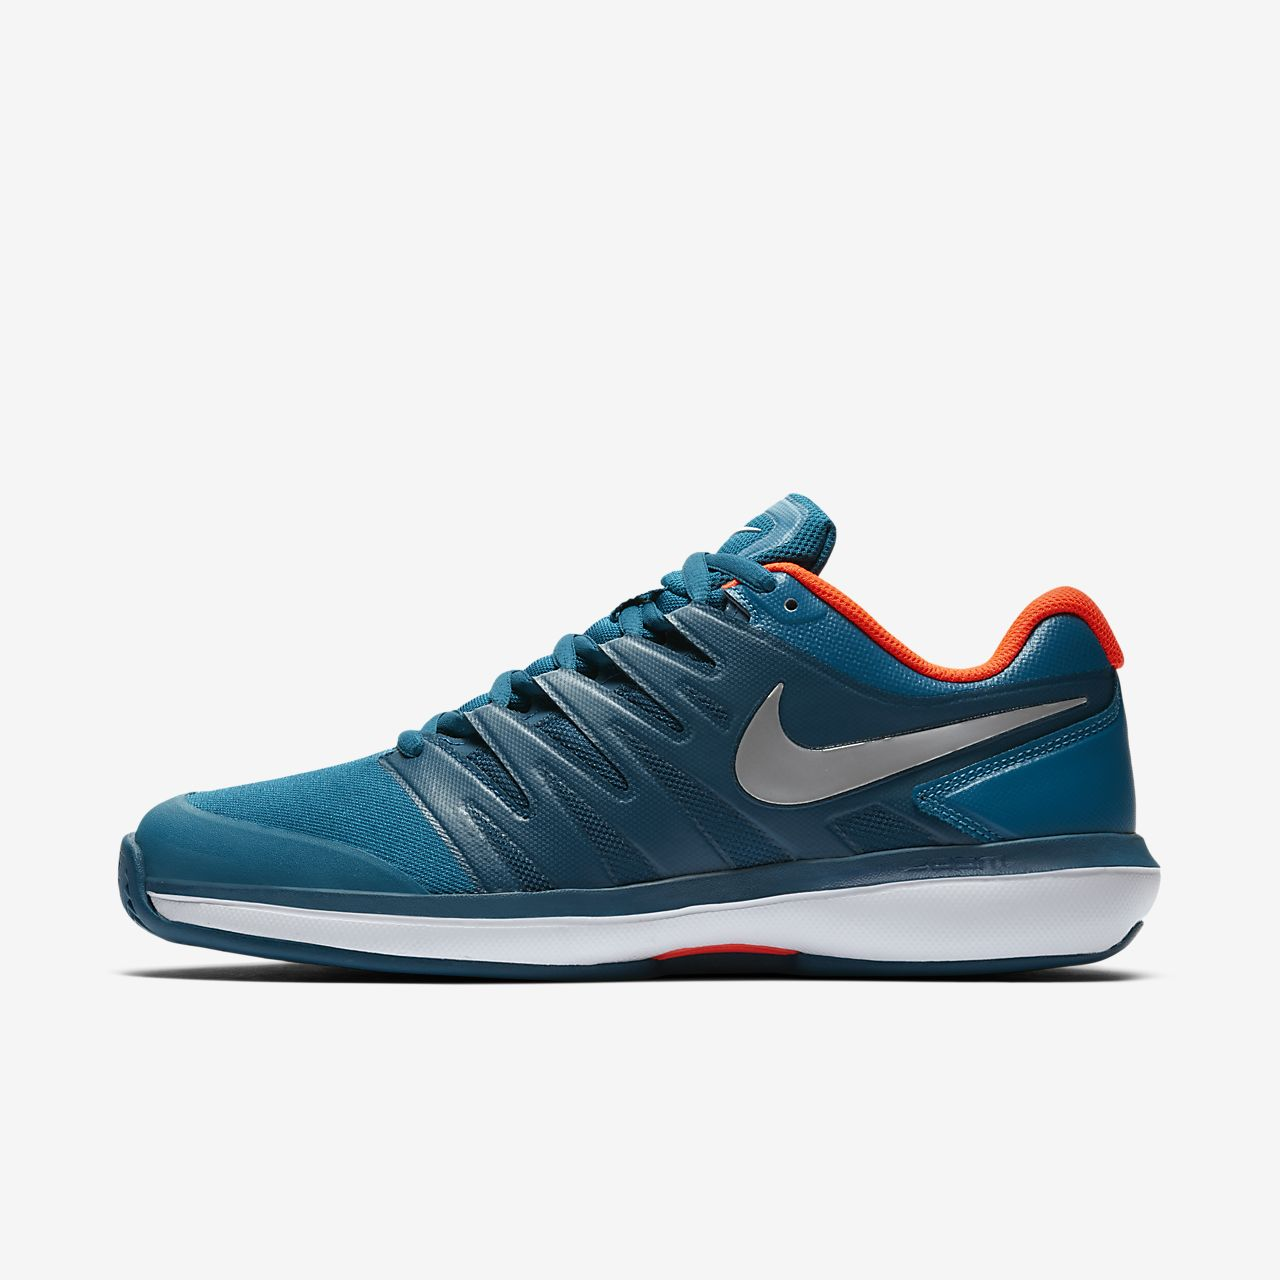 Nike PerformanceAIR ZOOM PRESTIGE HC - Multicourt shoes - gridiron/photo blue/atmosphere grey/platinum tint 655dP5